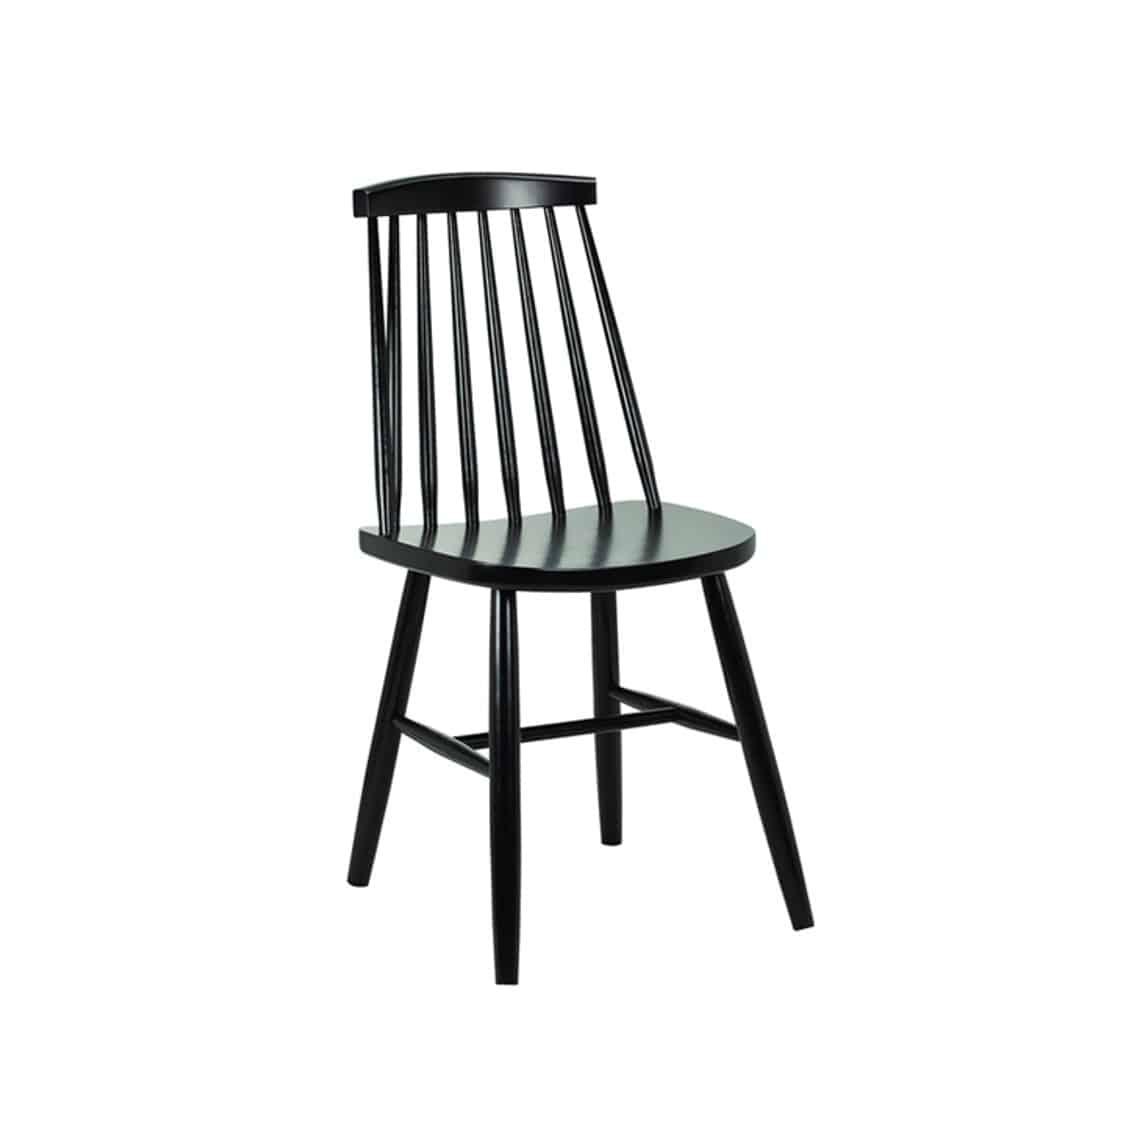 Wondrous Henry Side Chair Evergreenethics Interior Chair Design Evergreenethicsorg